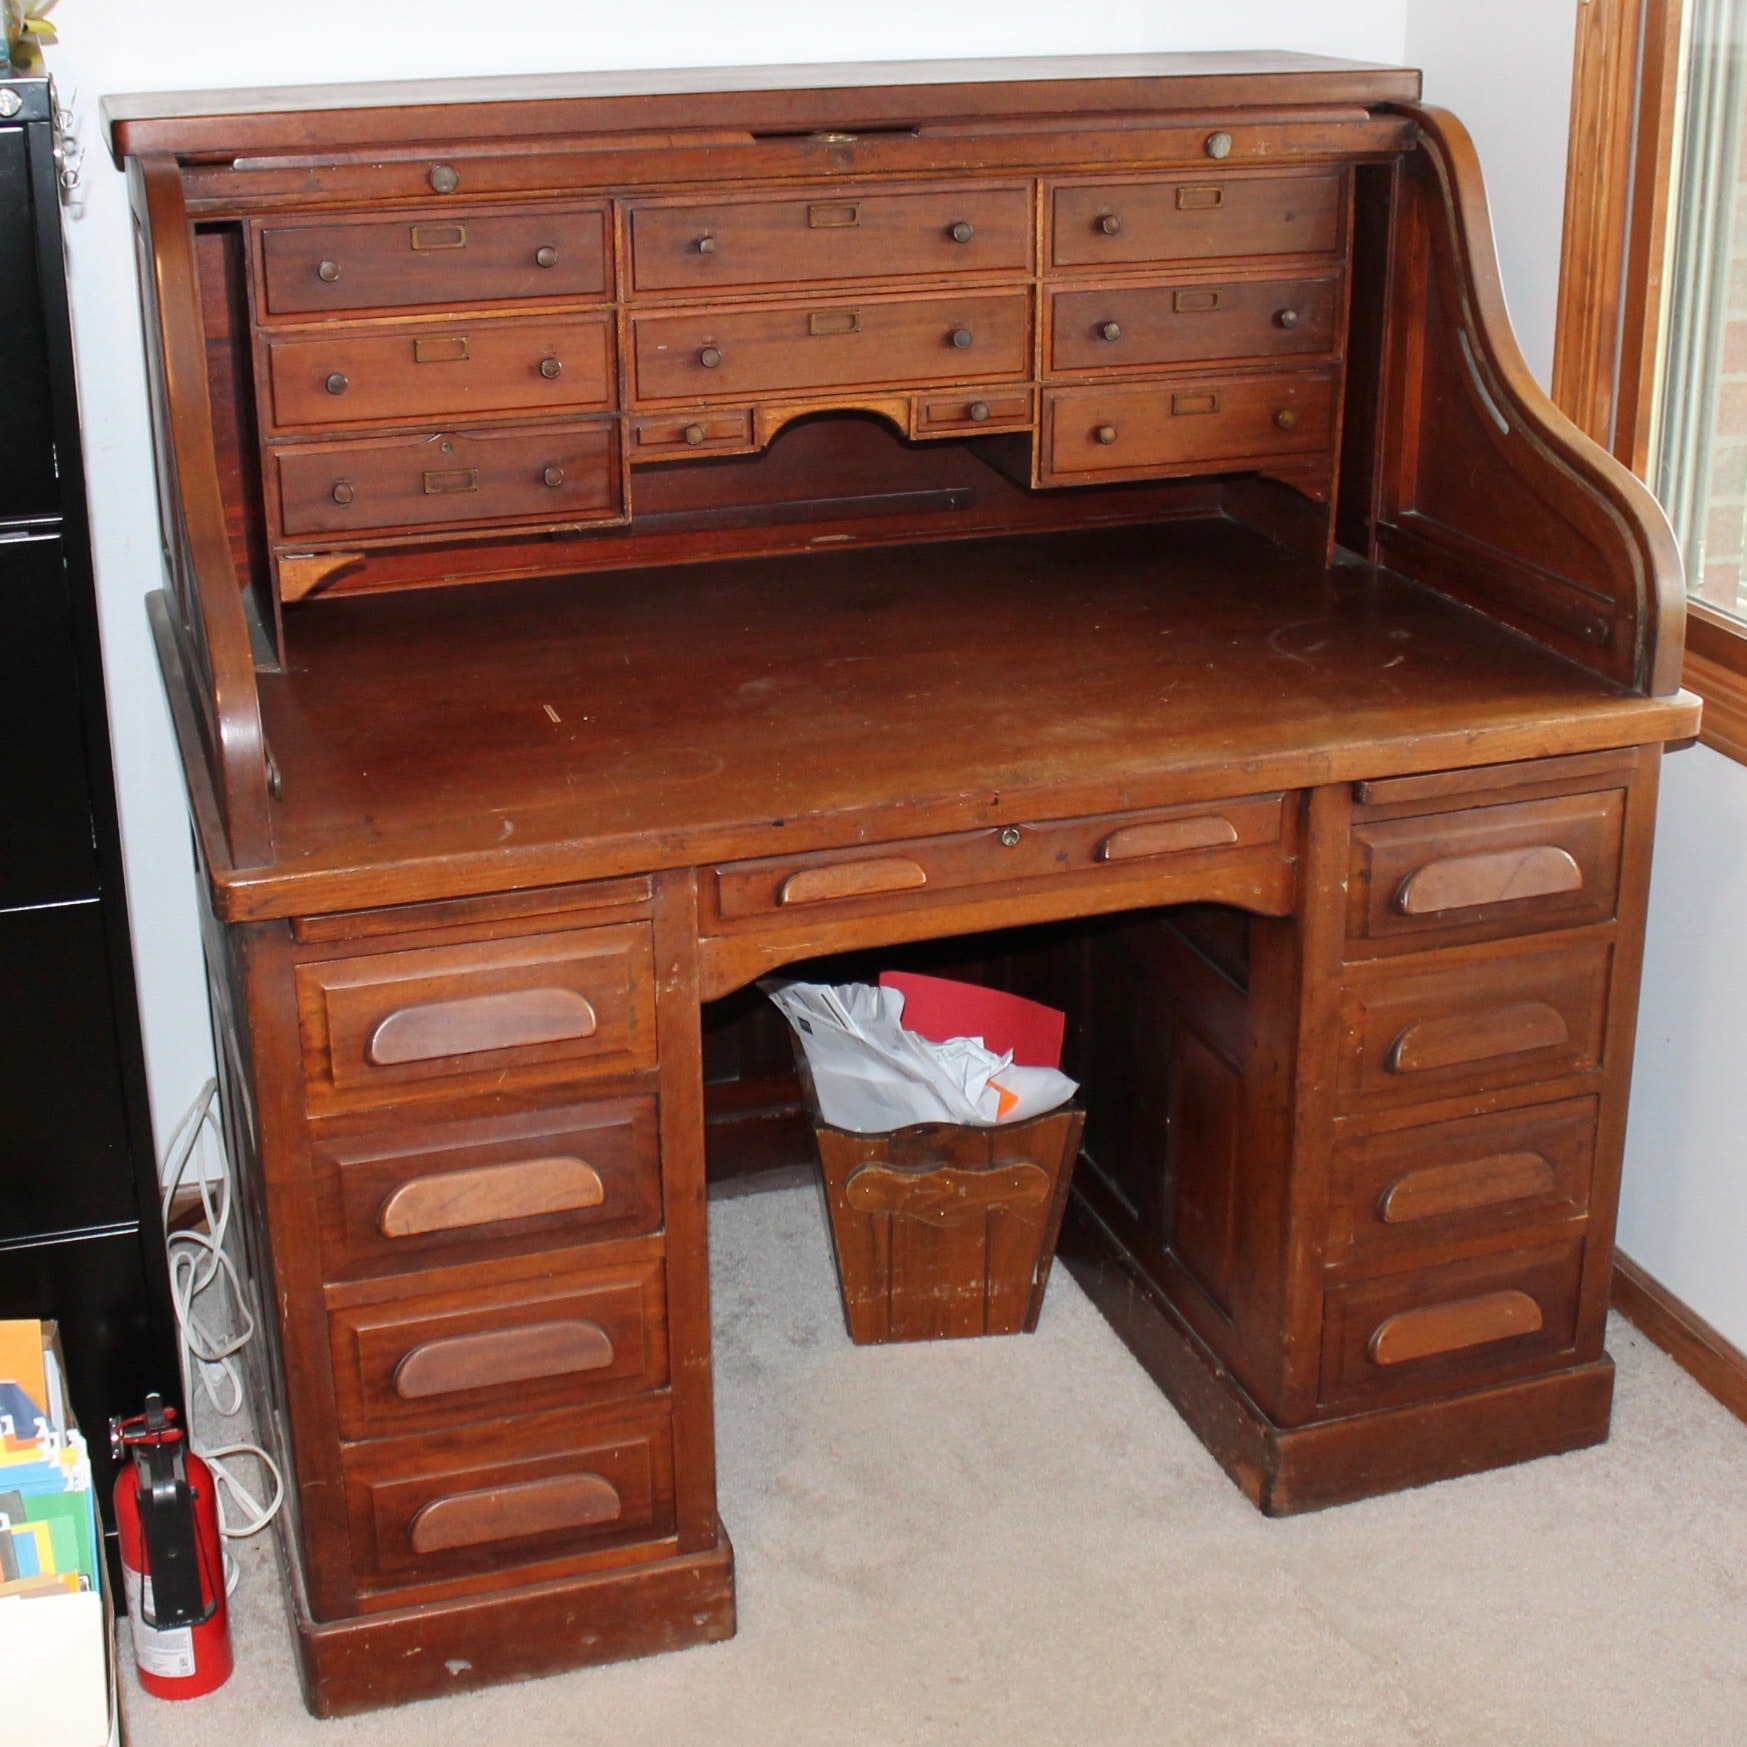 Antique Cleveland Desk Co. Mahogany Roll Top Desk